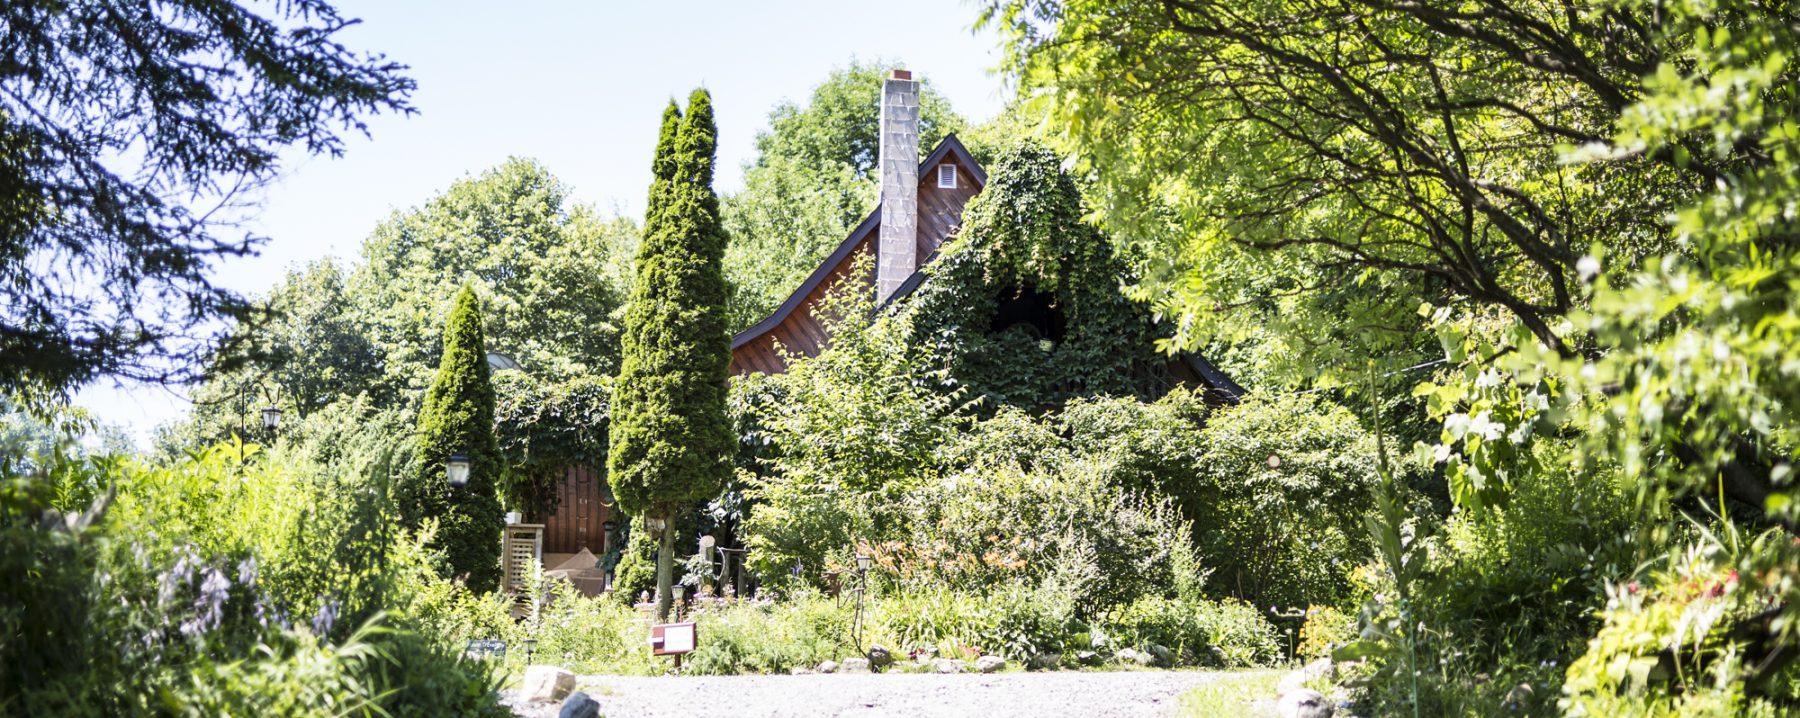 Maison d'Evelyne